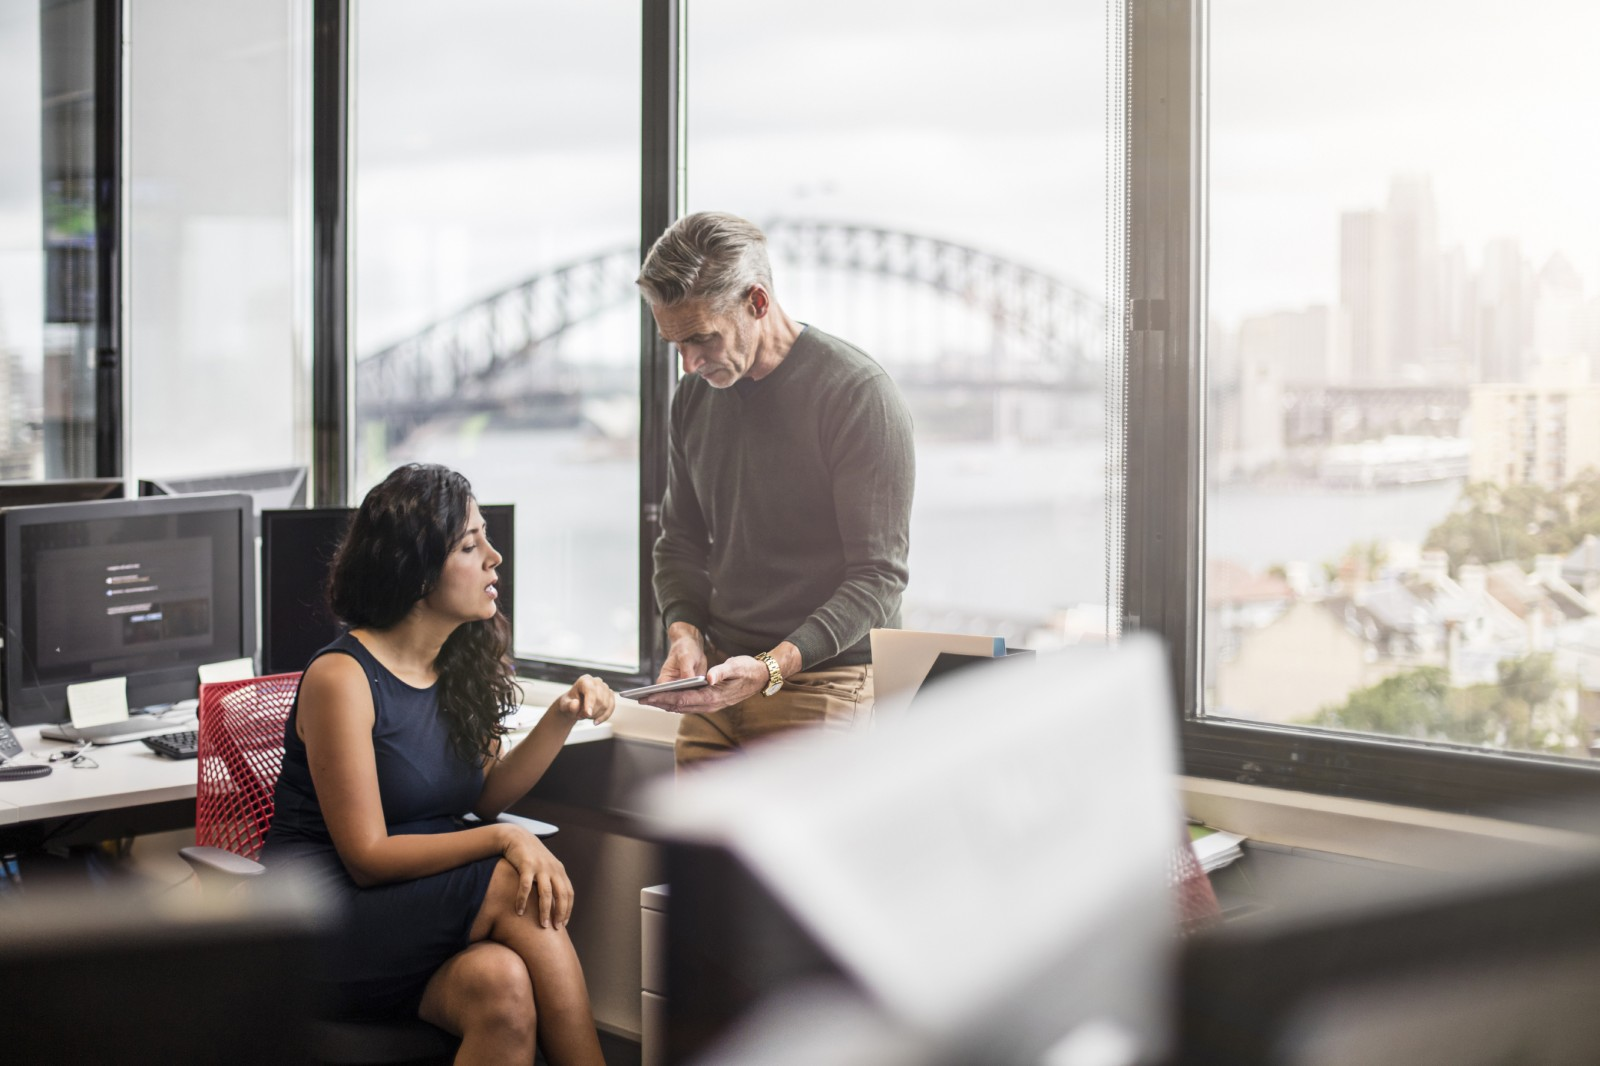 Australian Online Advertising Spending Surged in 2015